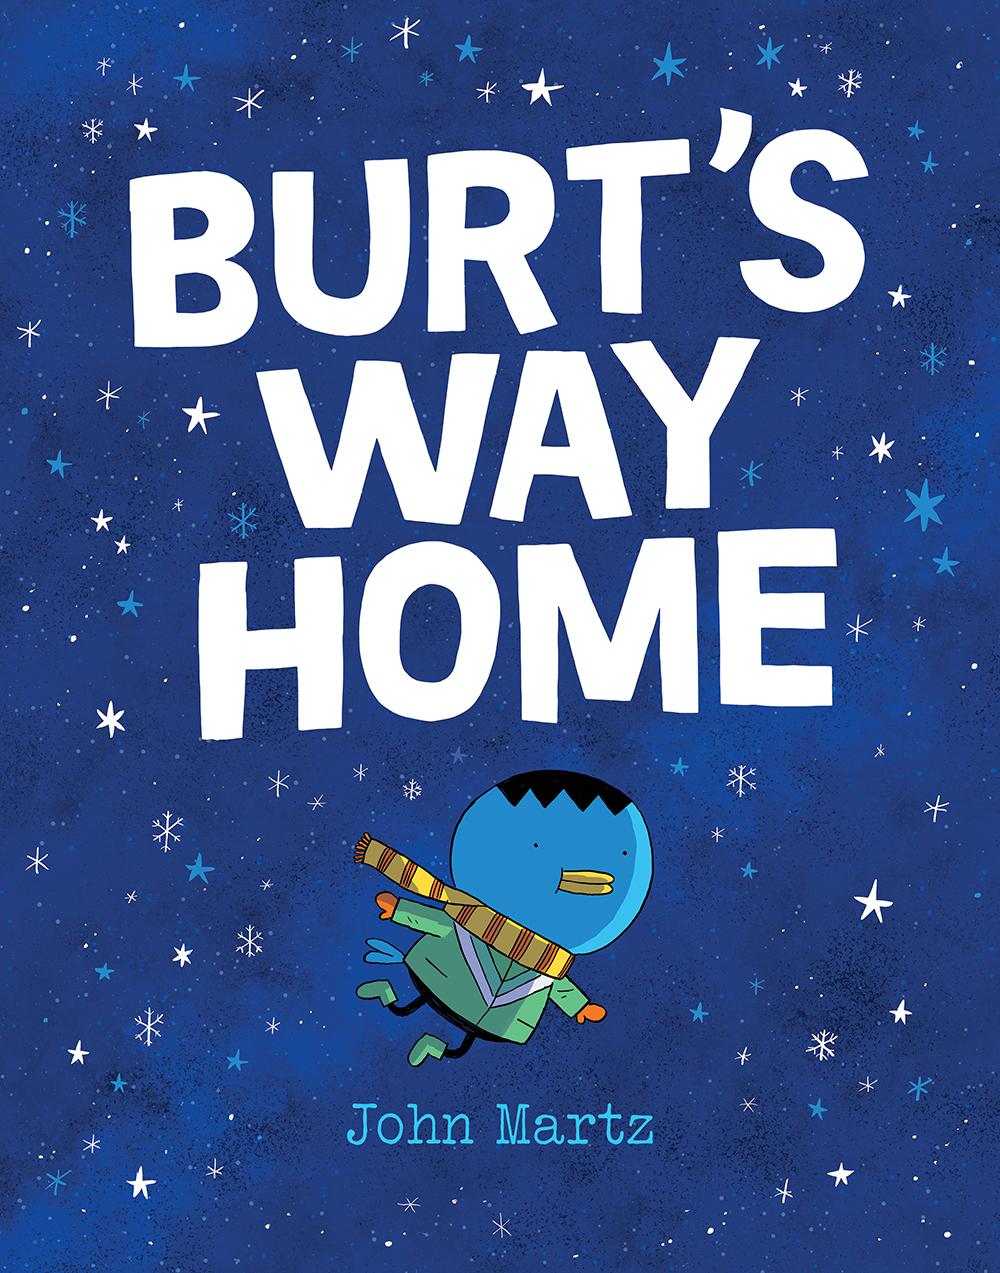 Burt's Way Home by John Martz - Cover